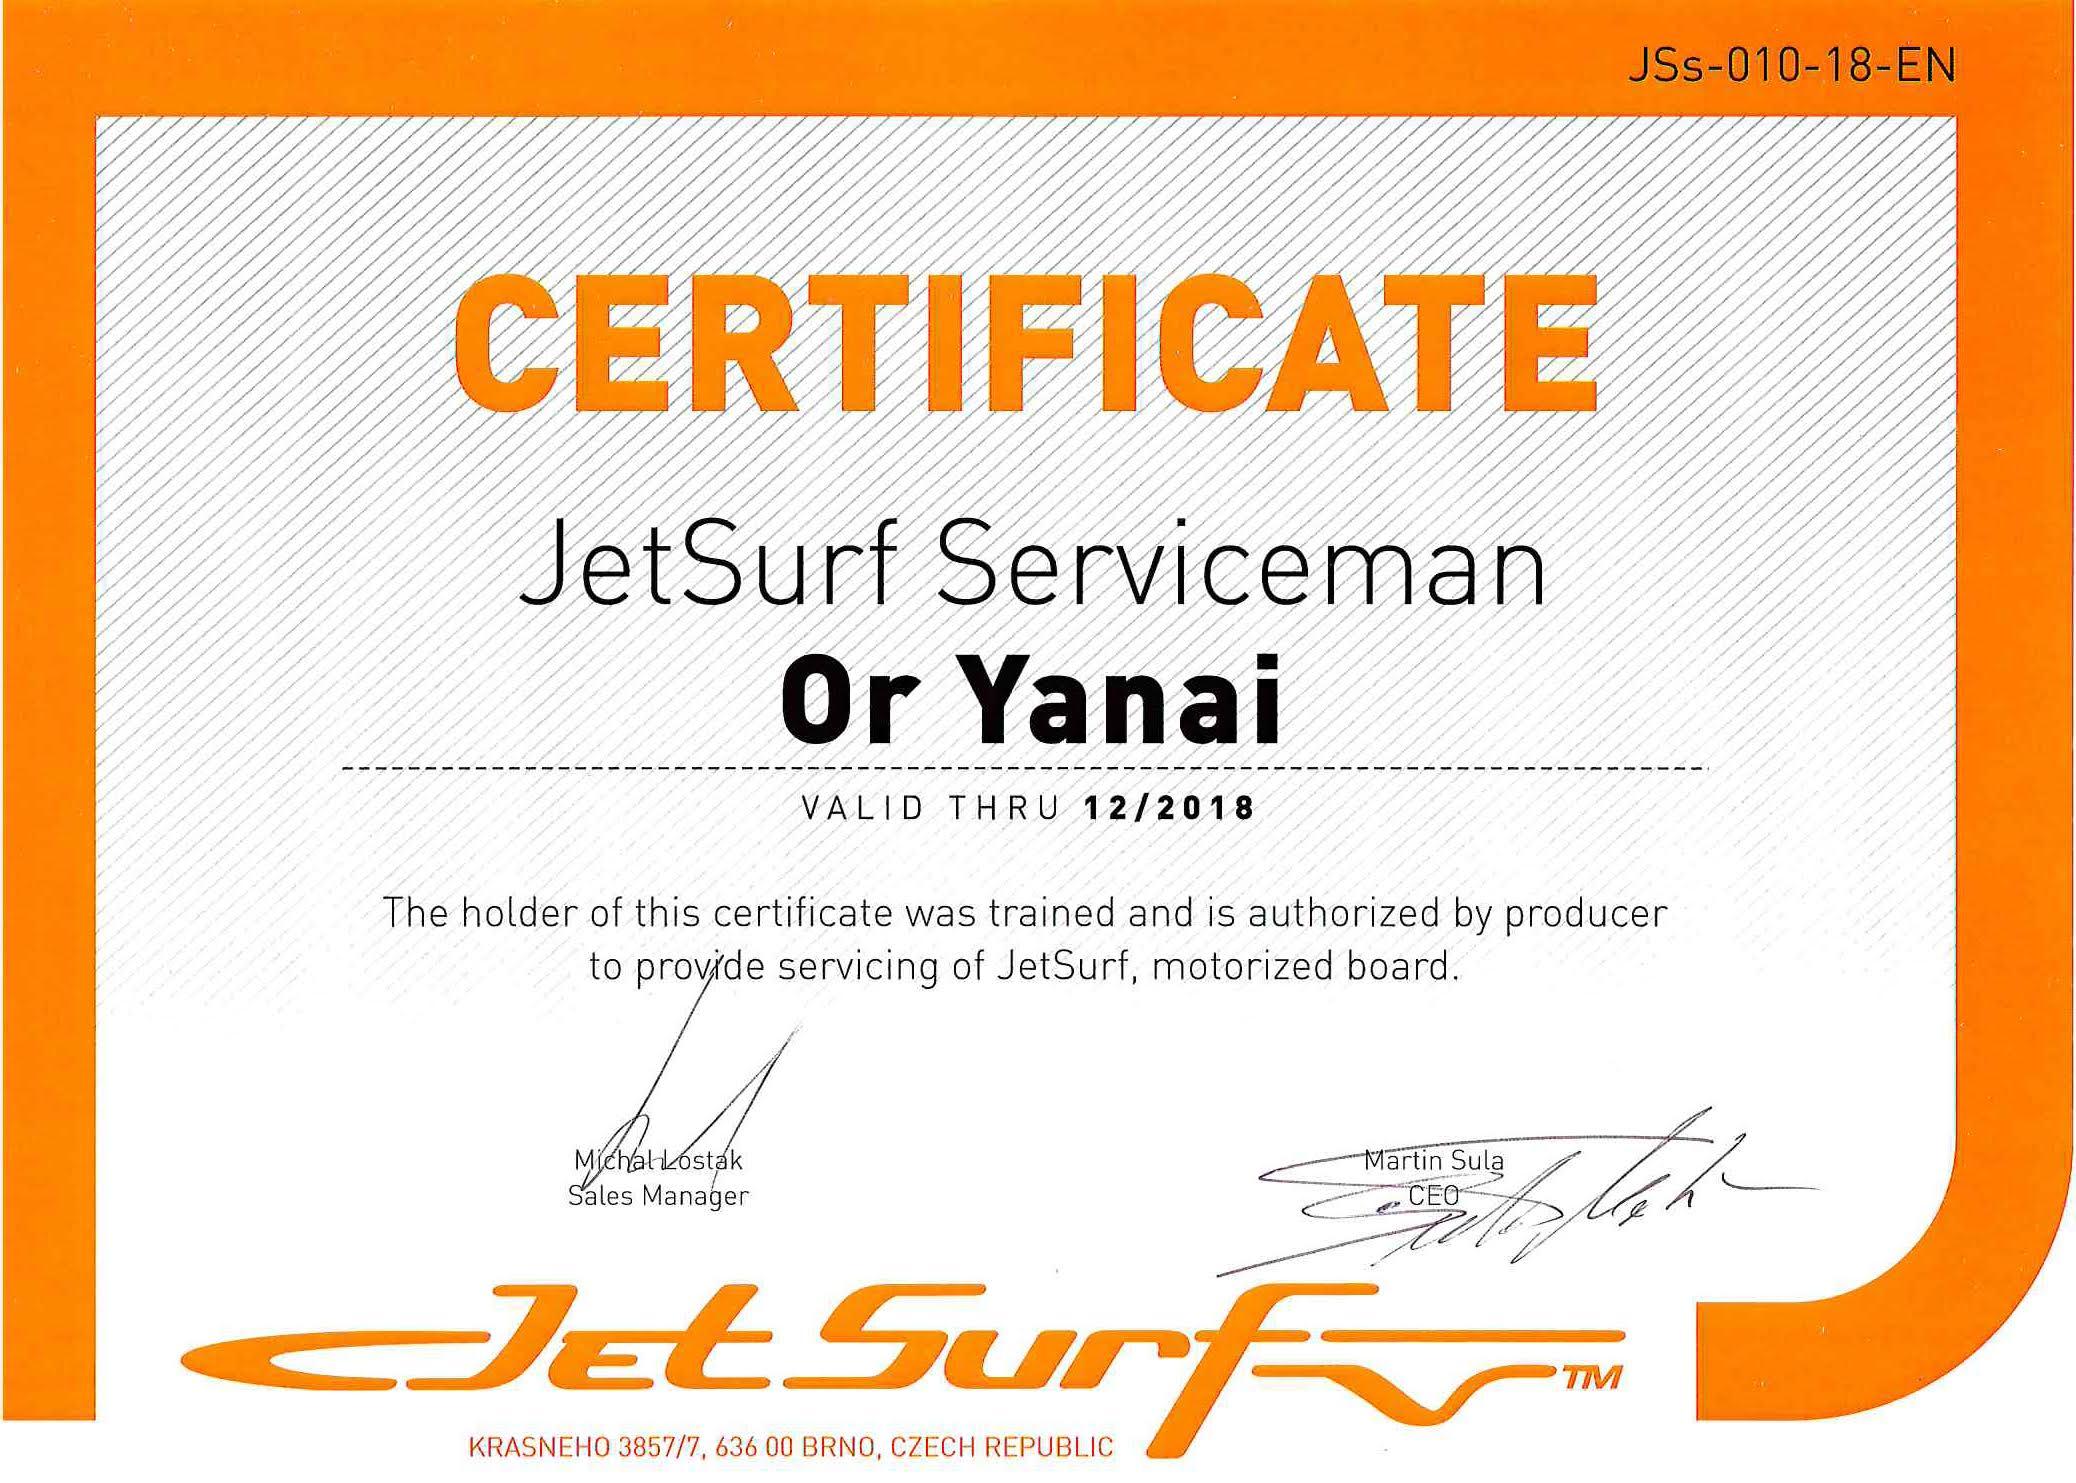 certificado jetsurf serviceman or yanai